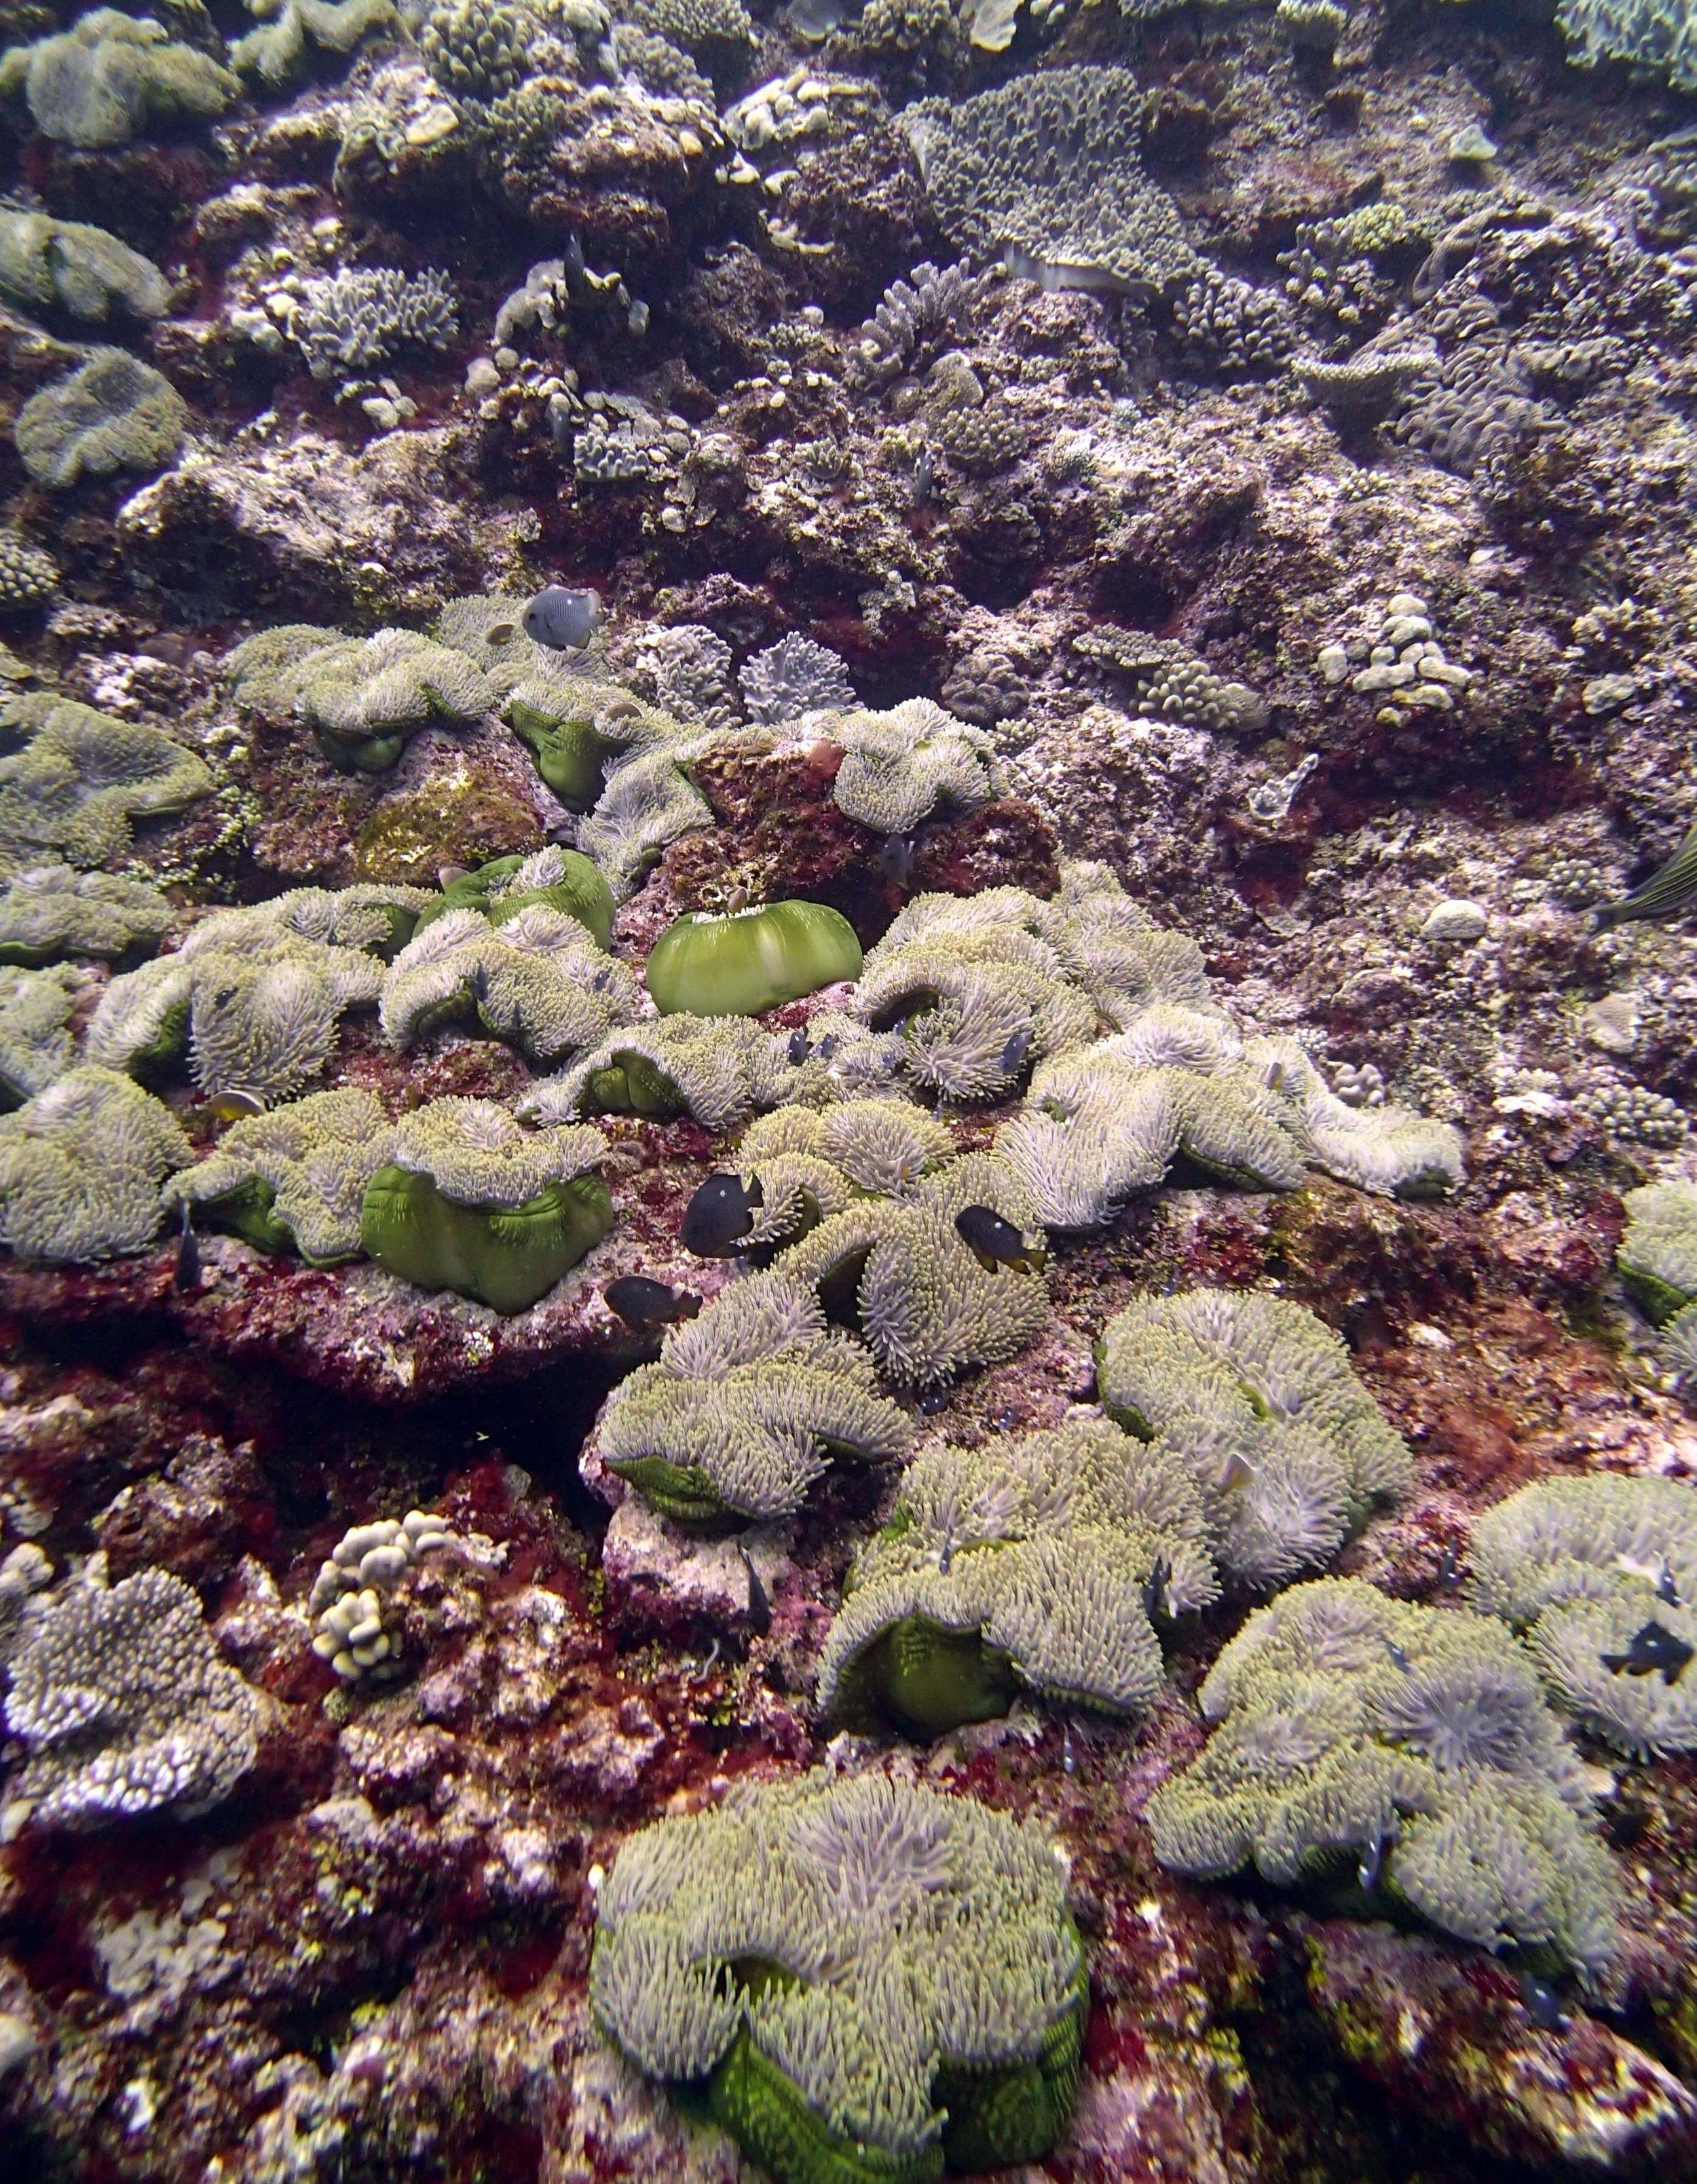 tons of anemones.jpg